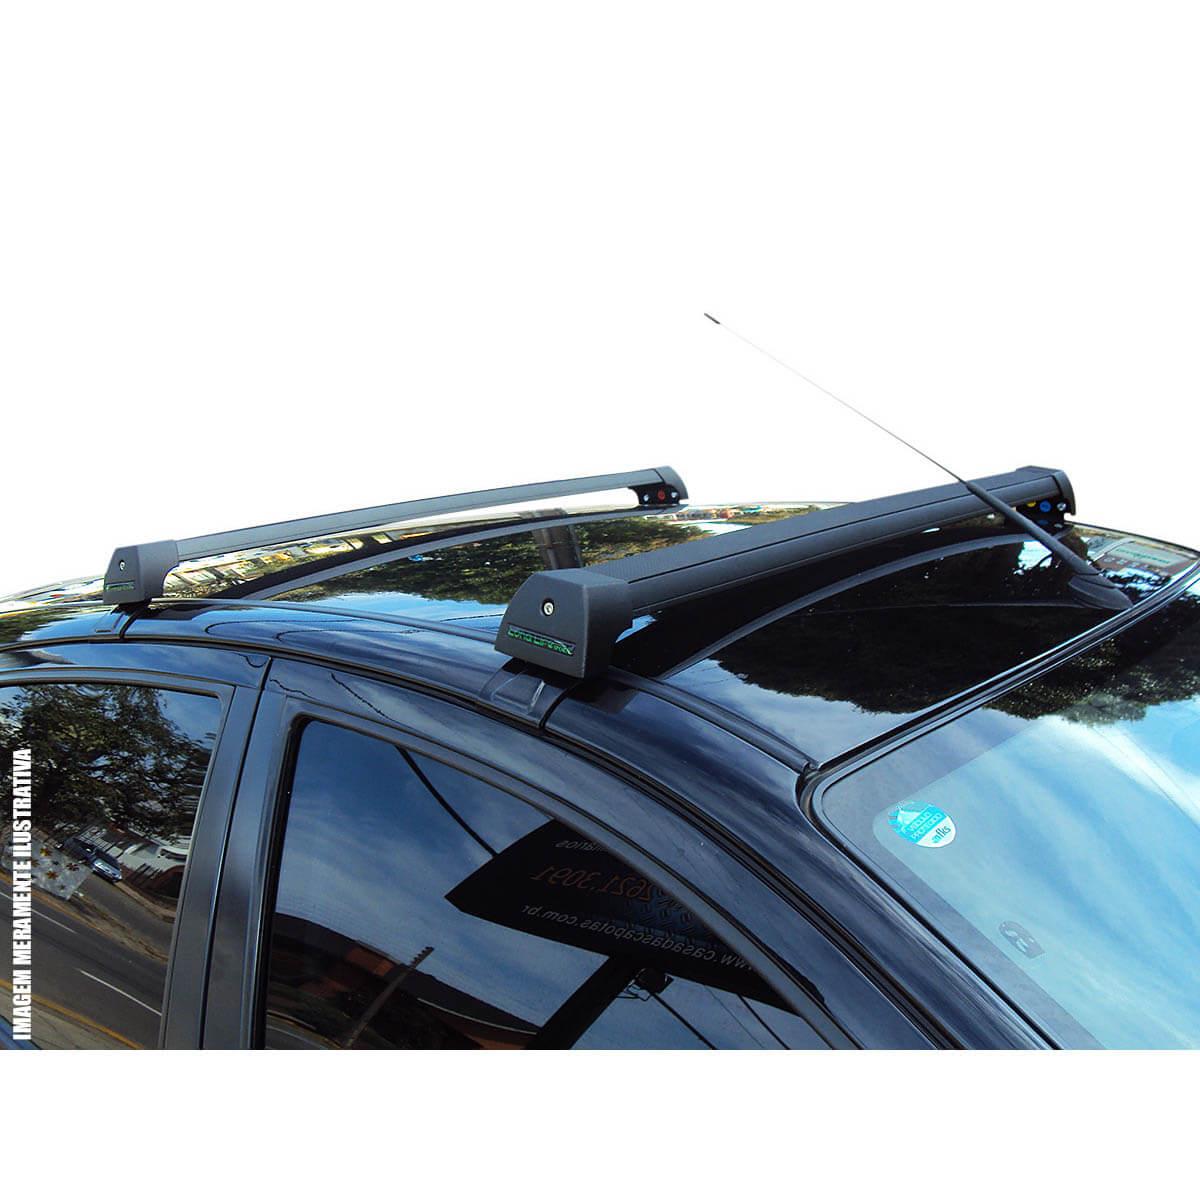 Rack de teto up! 2 ou 4 portas VW up 2014 a 2020 Long Life Sports preto